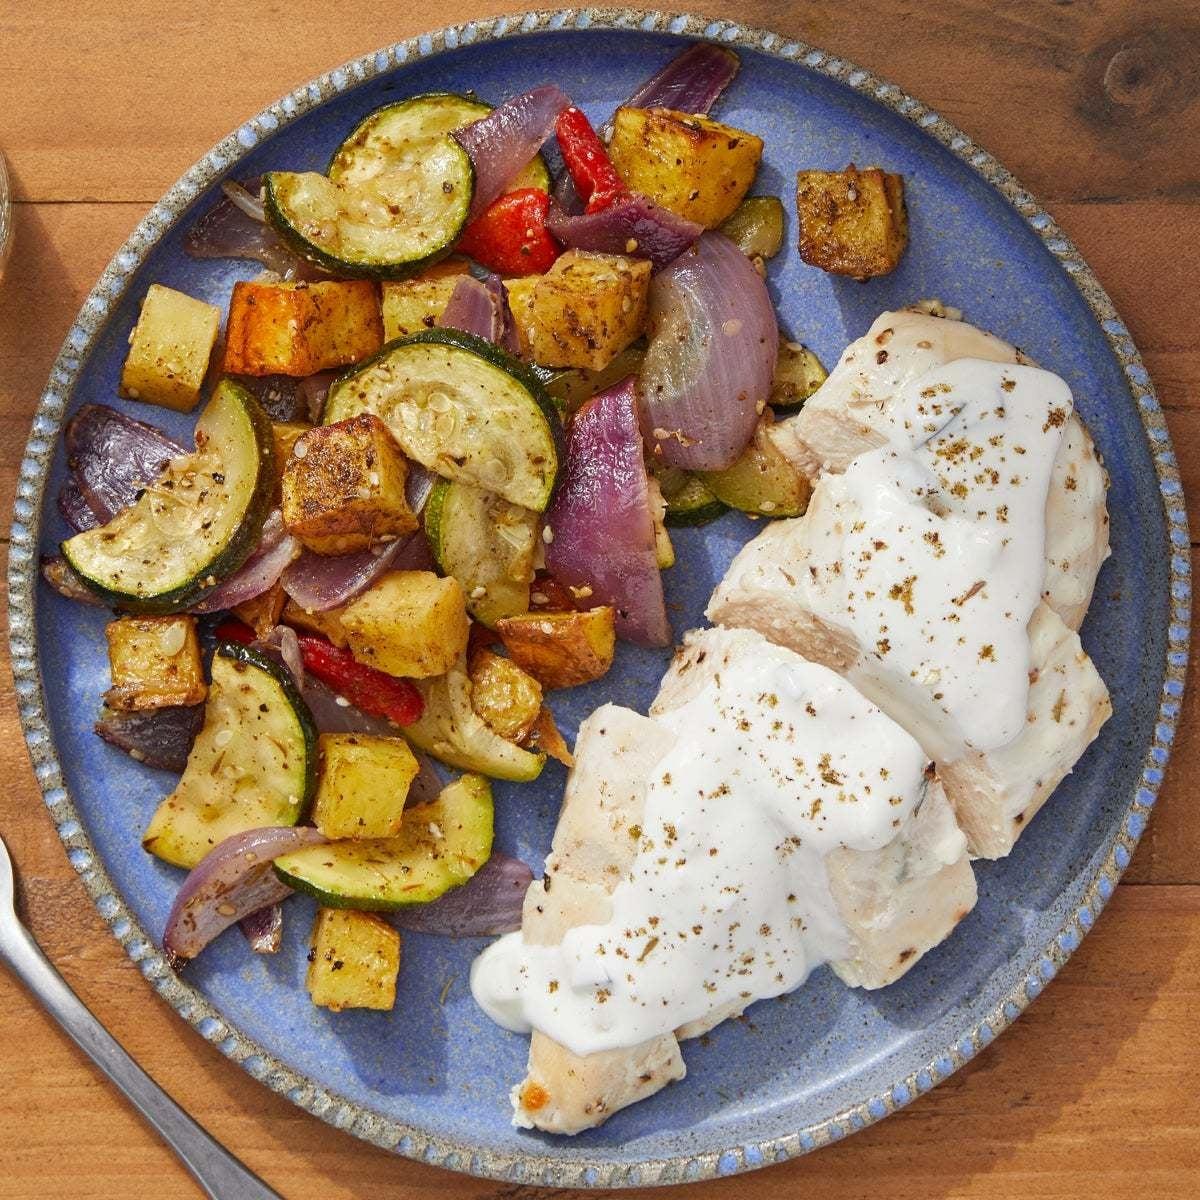 Sheet Pan Chicken & Vegetables with Tzatiki